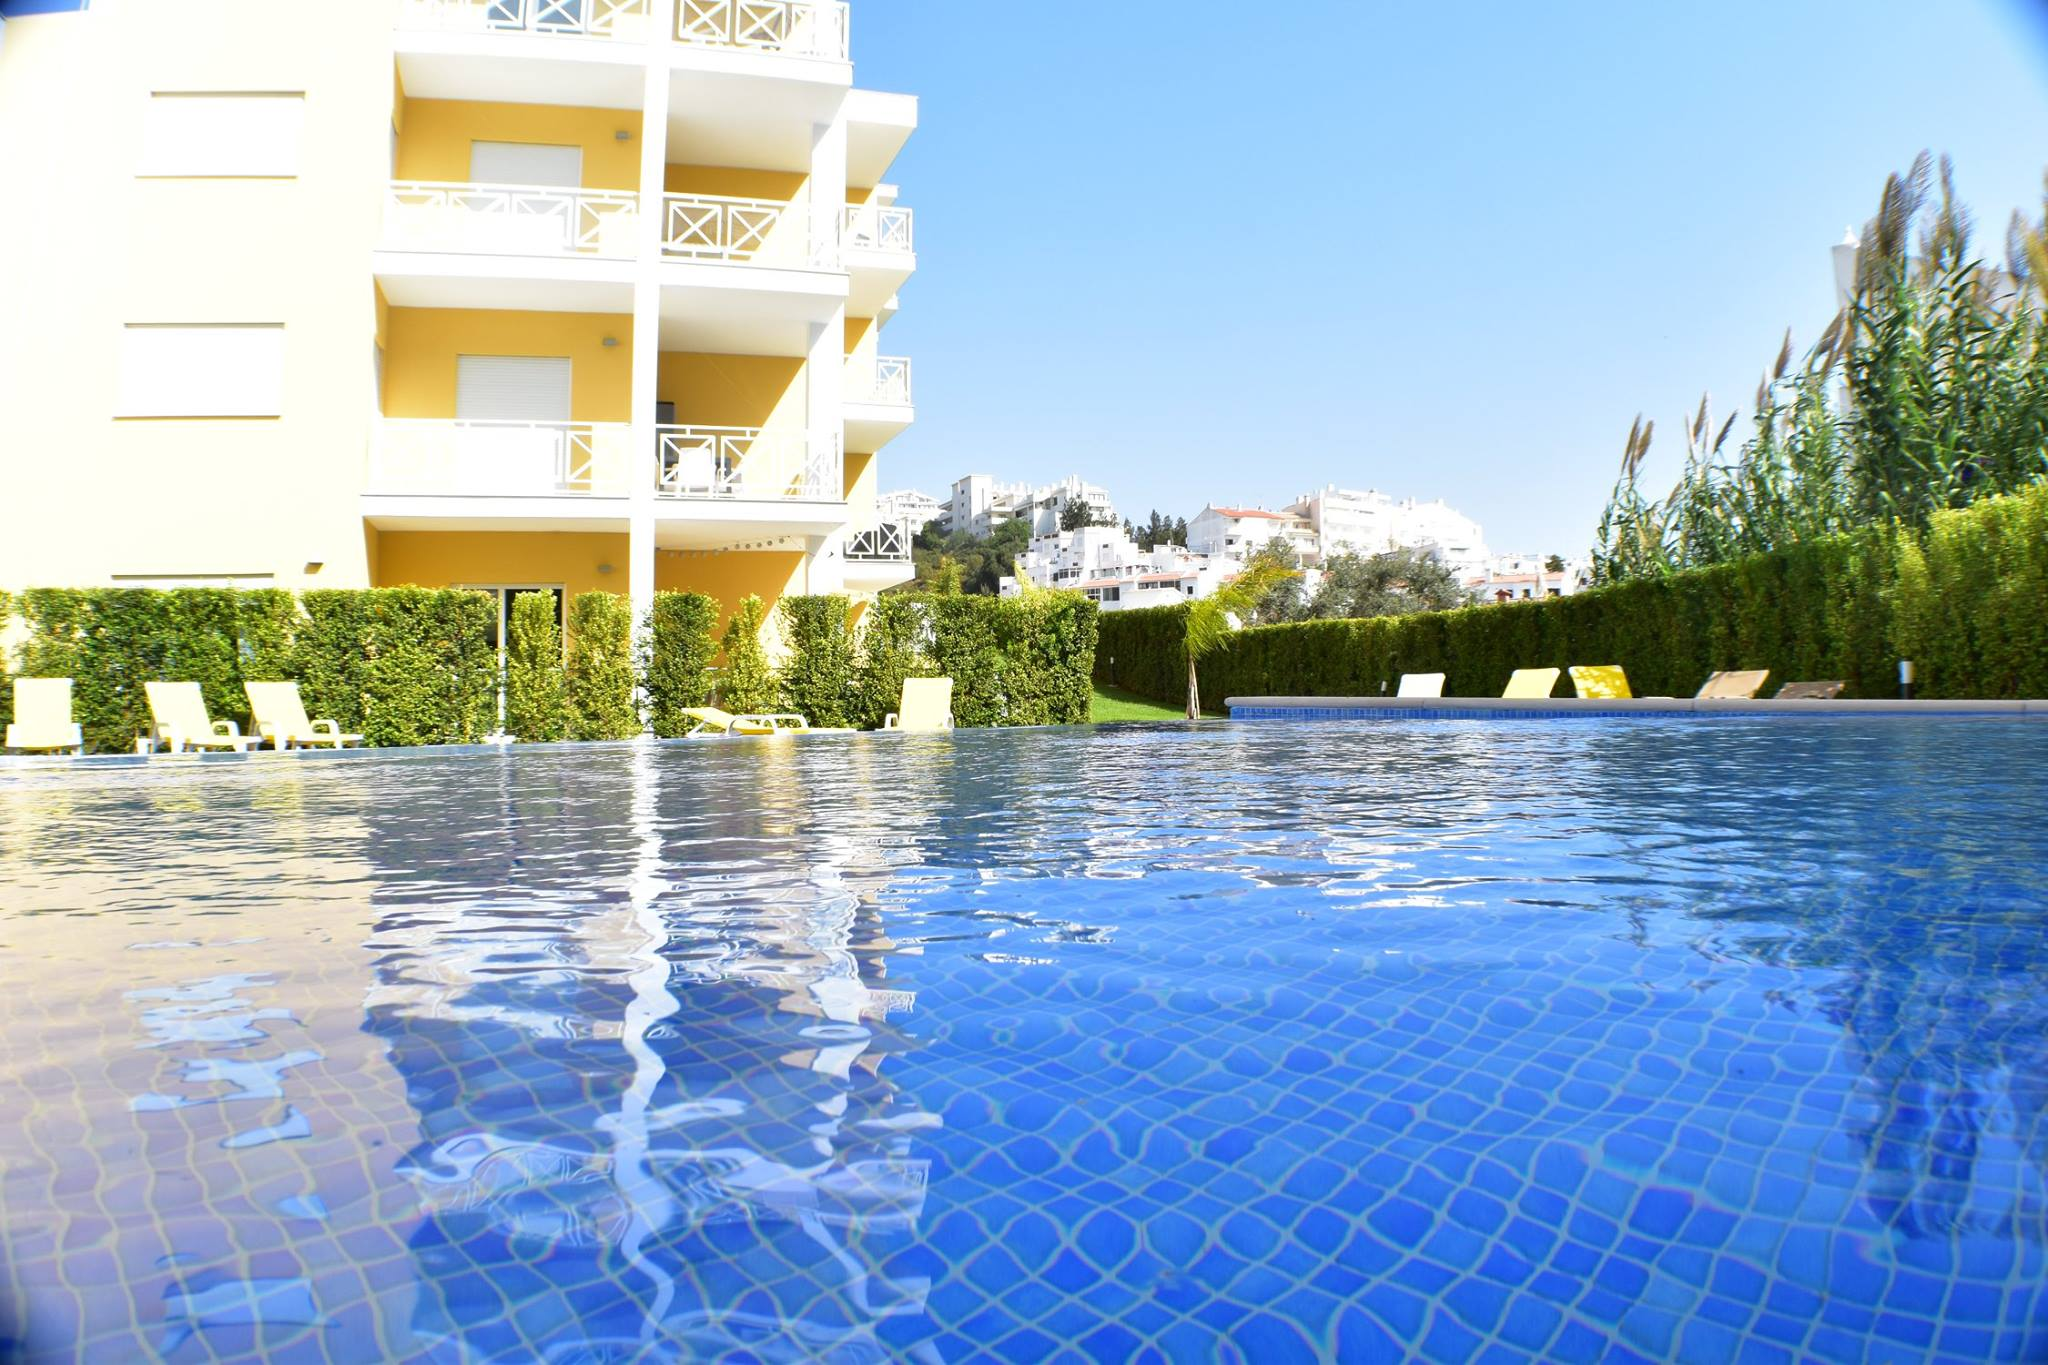 Algarve Stylish 2 Bedroom Duplex Apartment in Albufeira  - Albufeira